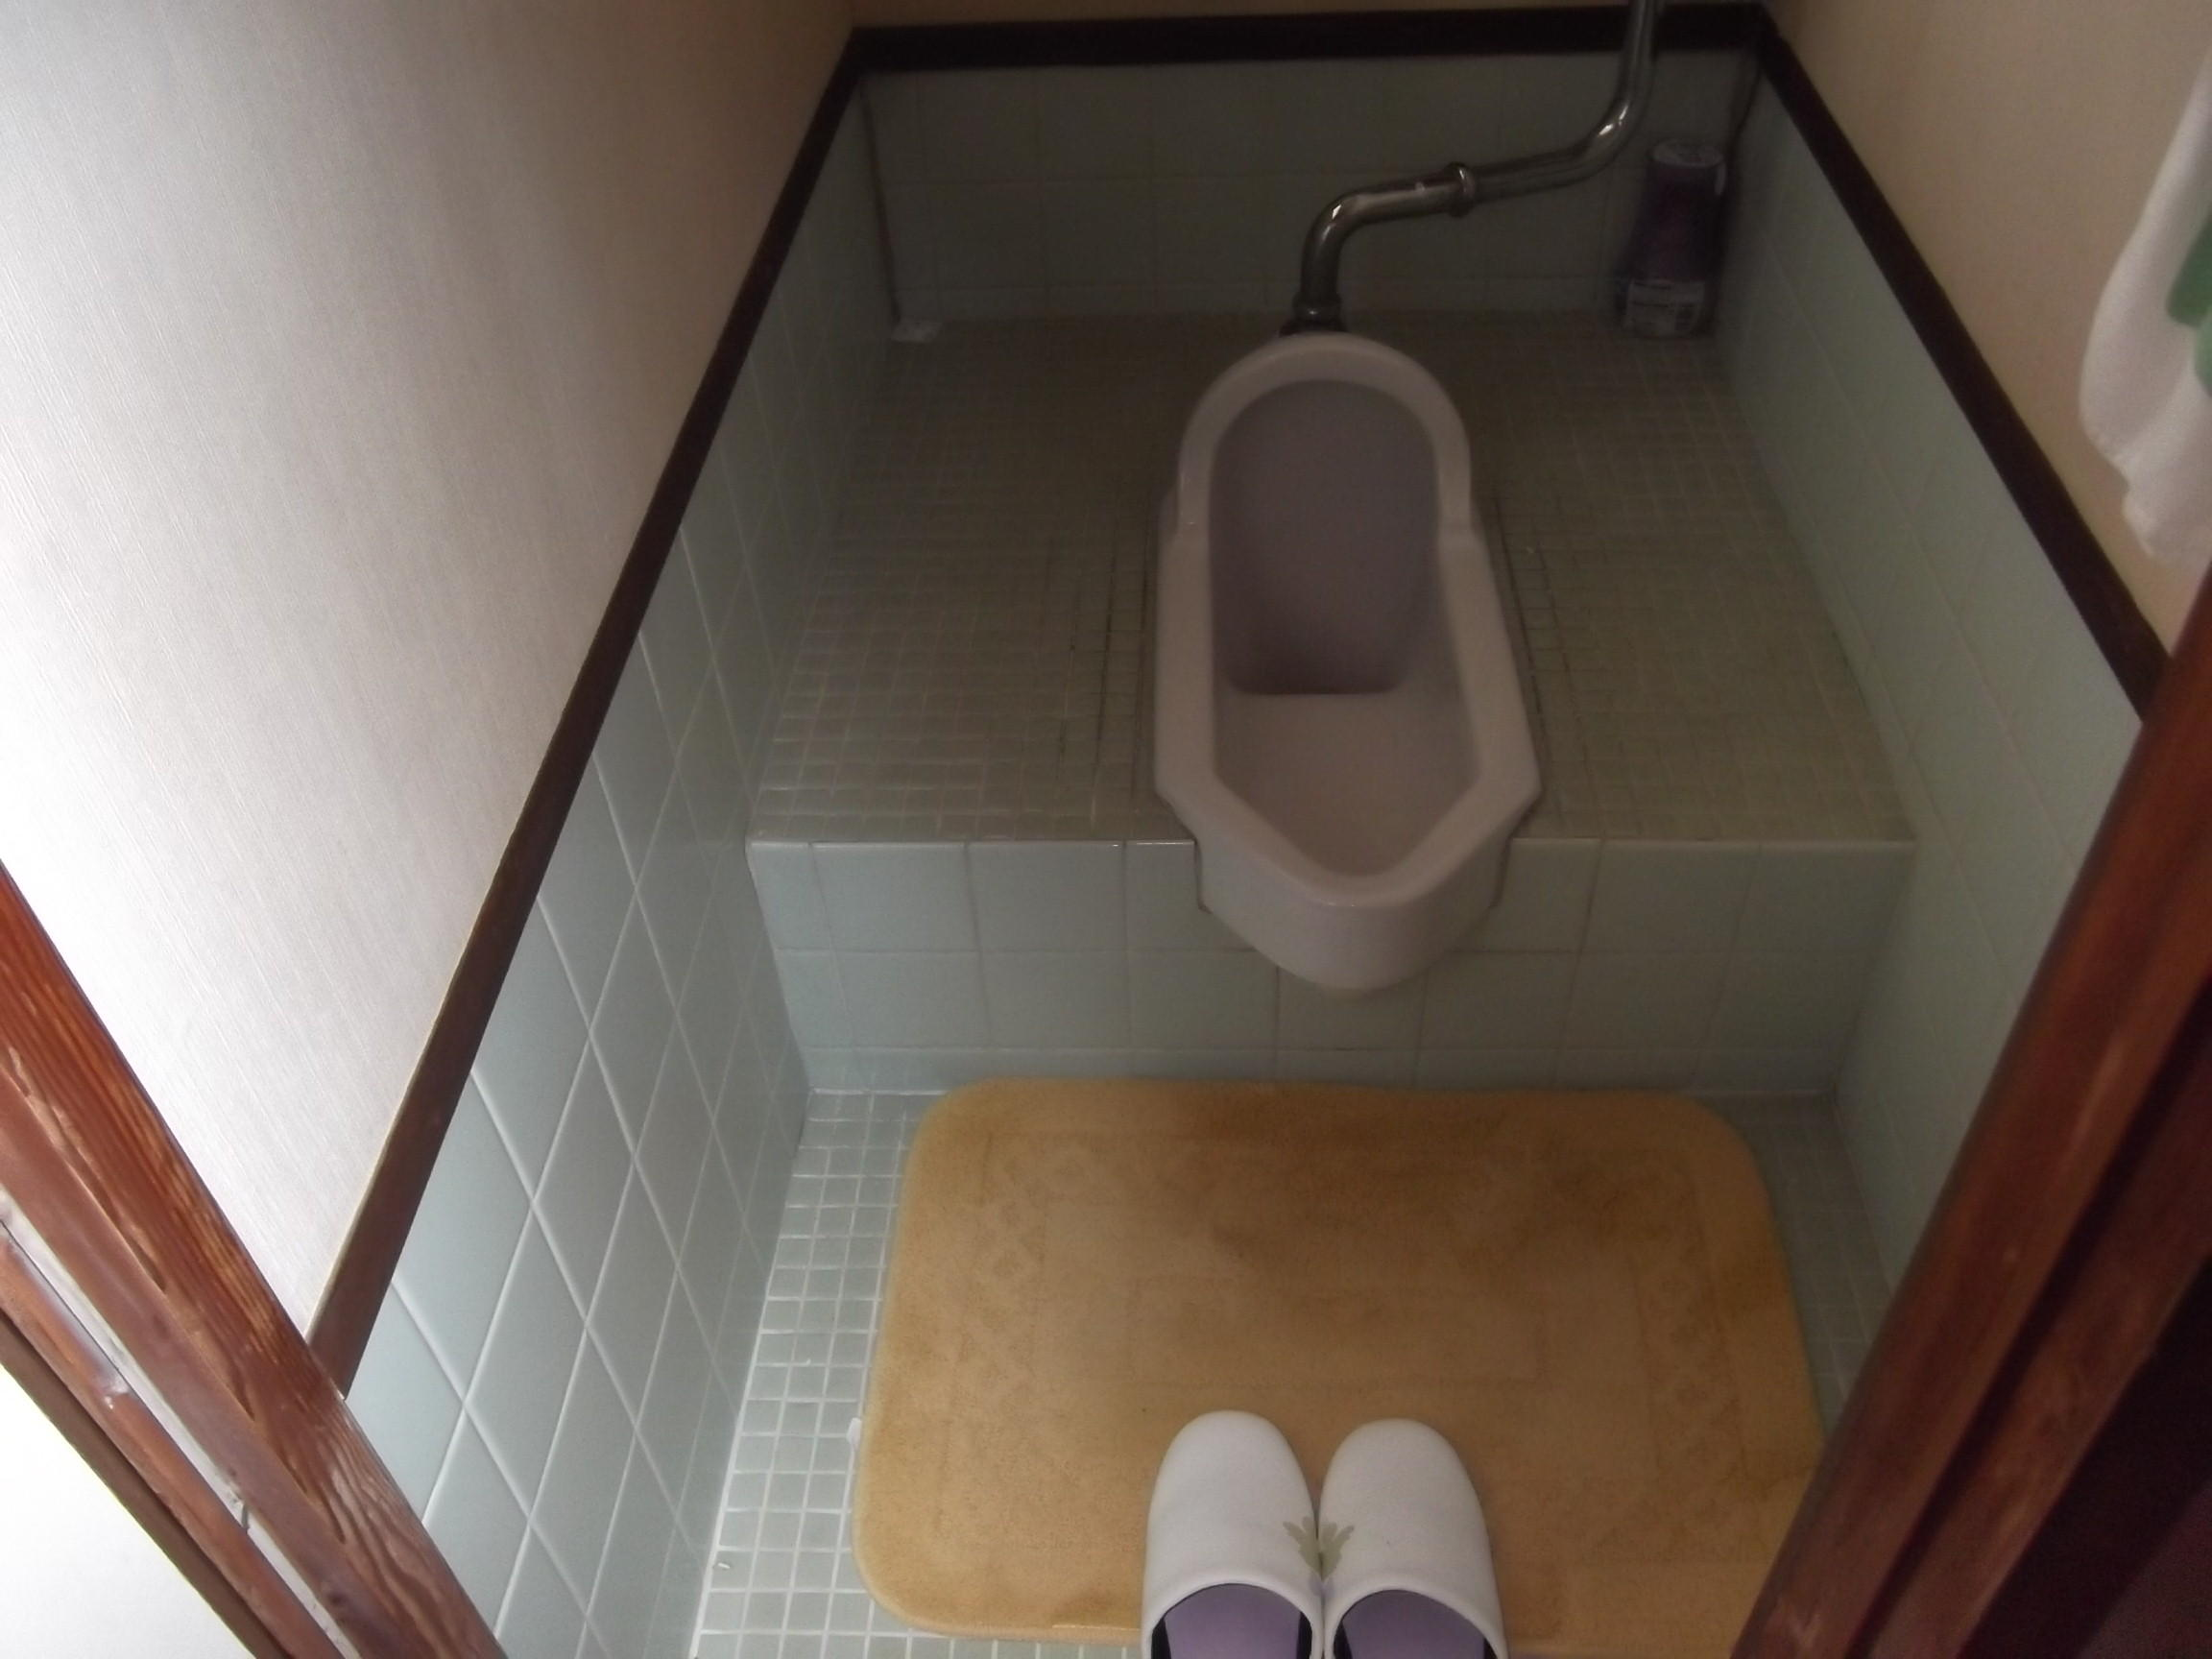 U様邸。和式トイレから洋式トイレへのリフォーム事例です。